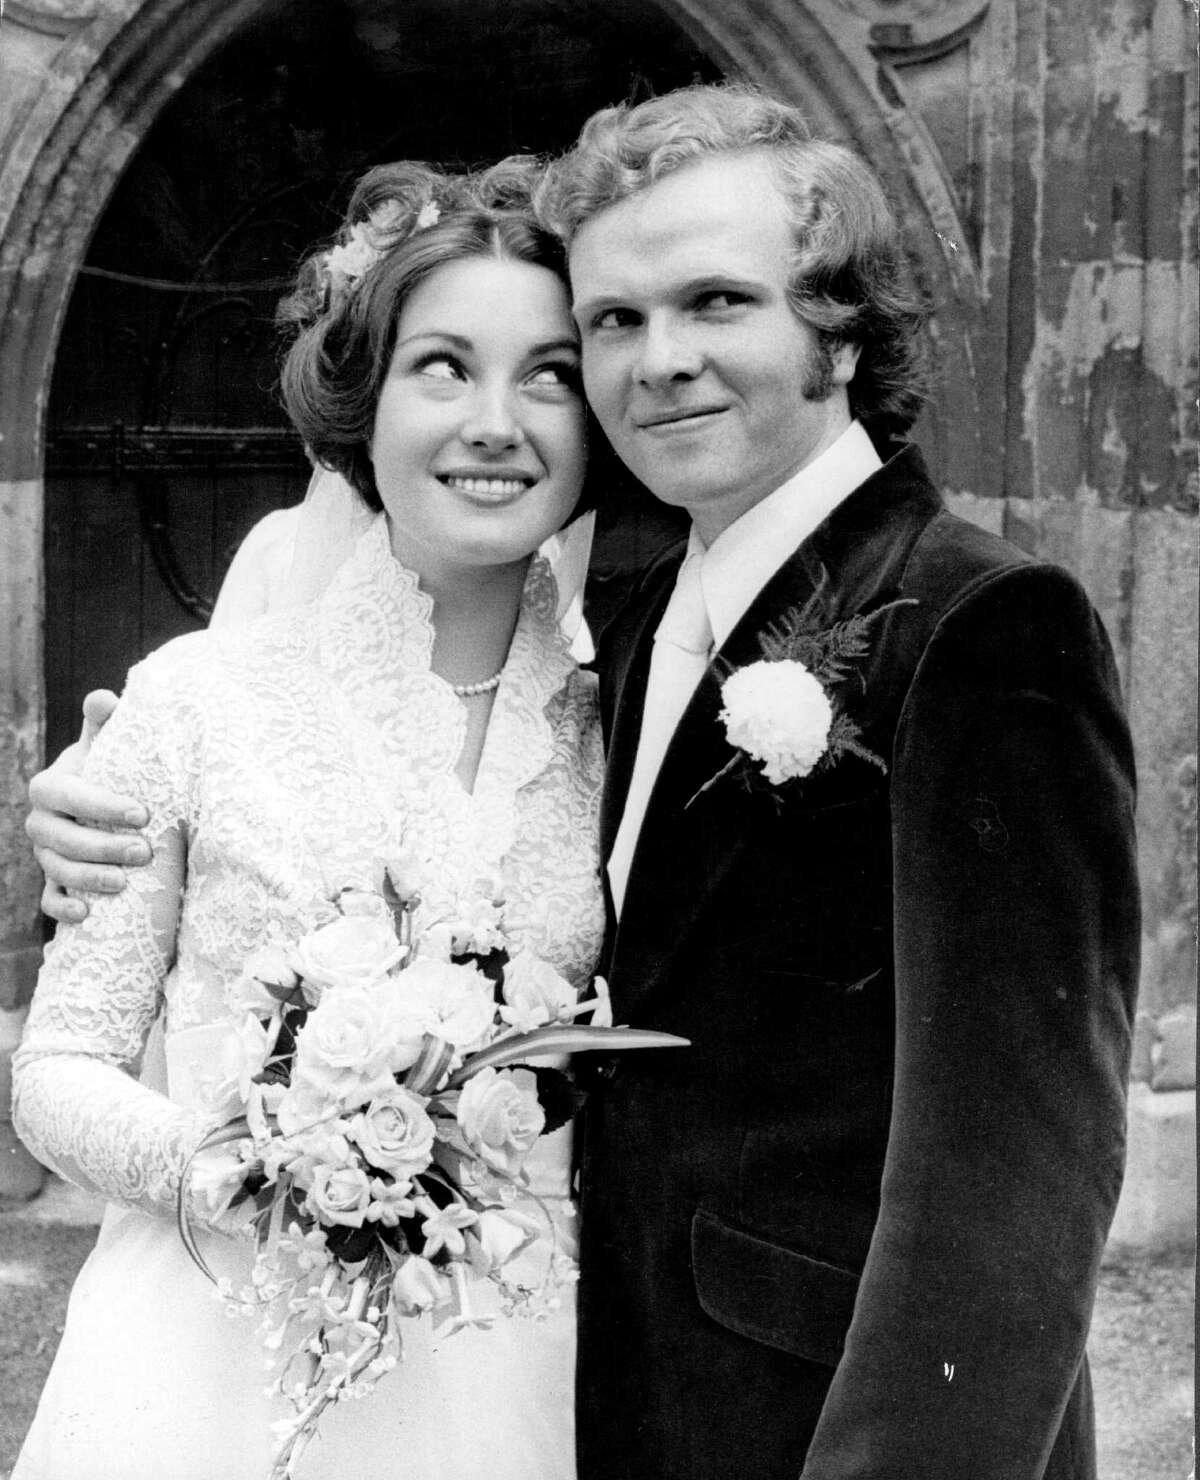 1971: Seymour and Michael Attenborough, son of Richard Attenborough, on their wedding day.